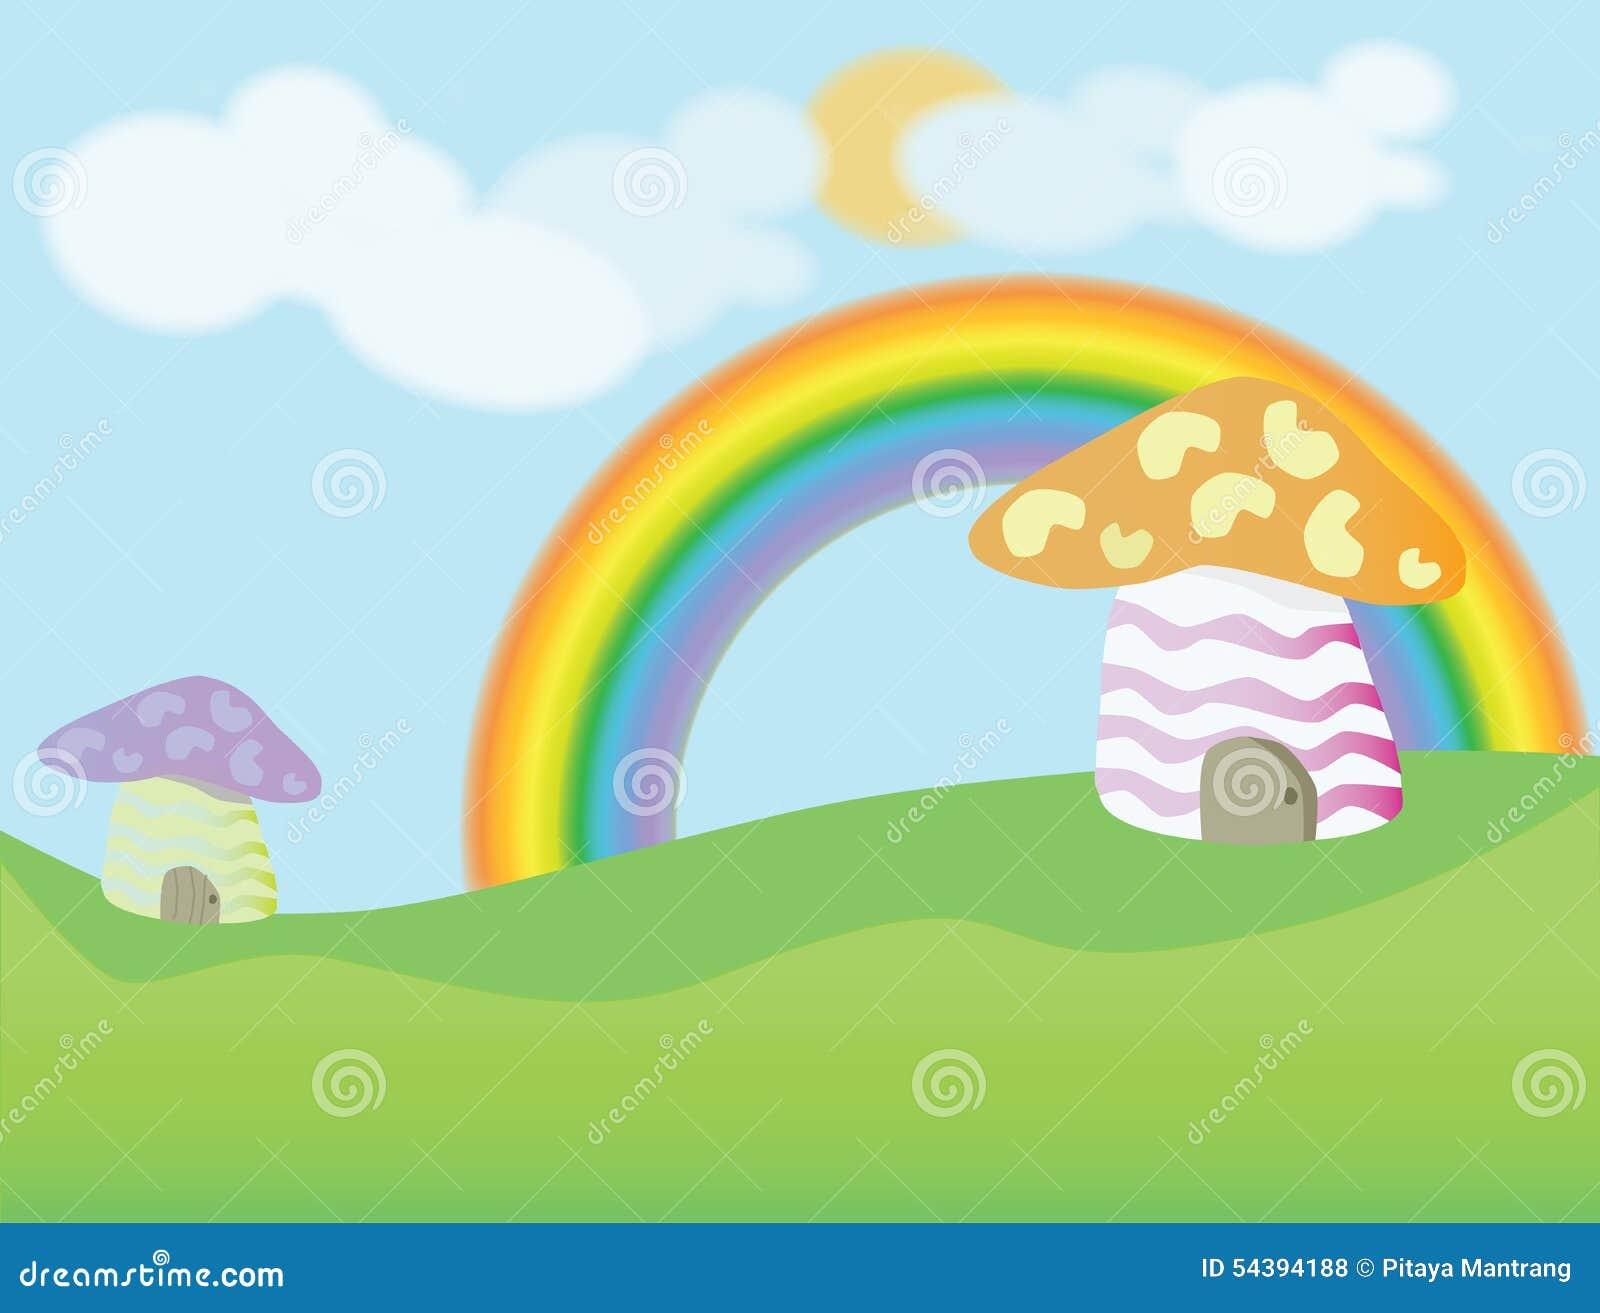 Mushroom House Cartoon Background Stock Vector Image